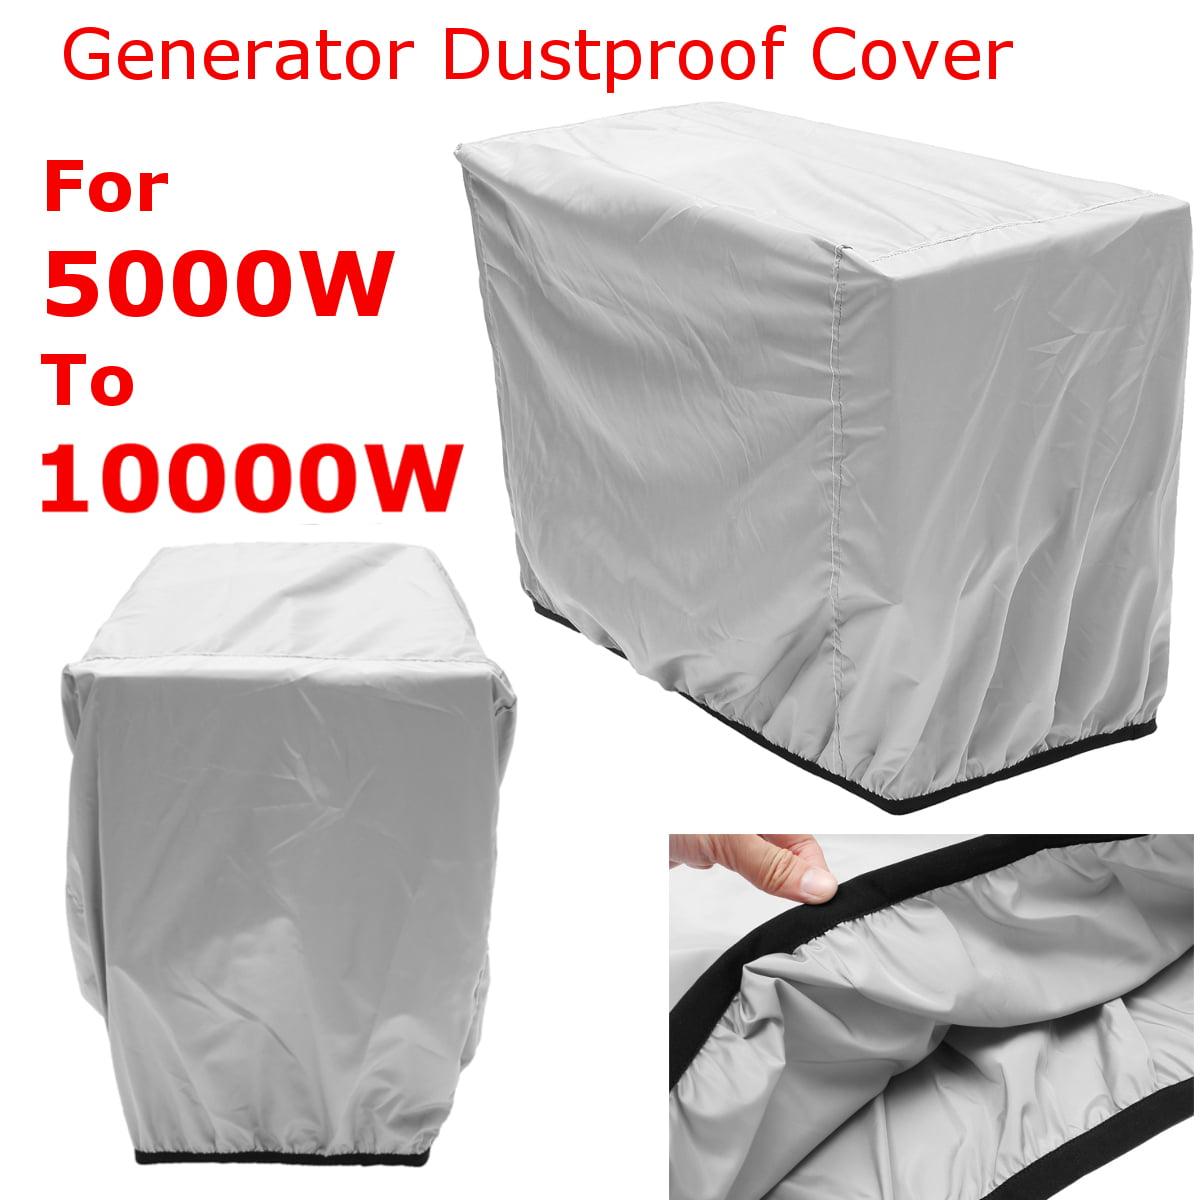 Generator Dustproof Large UV Weatherproof Cover For Generator 5000W To 10000W